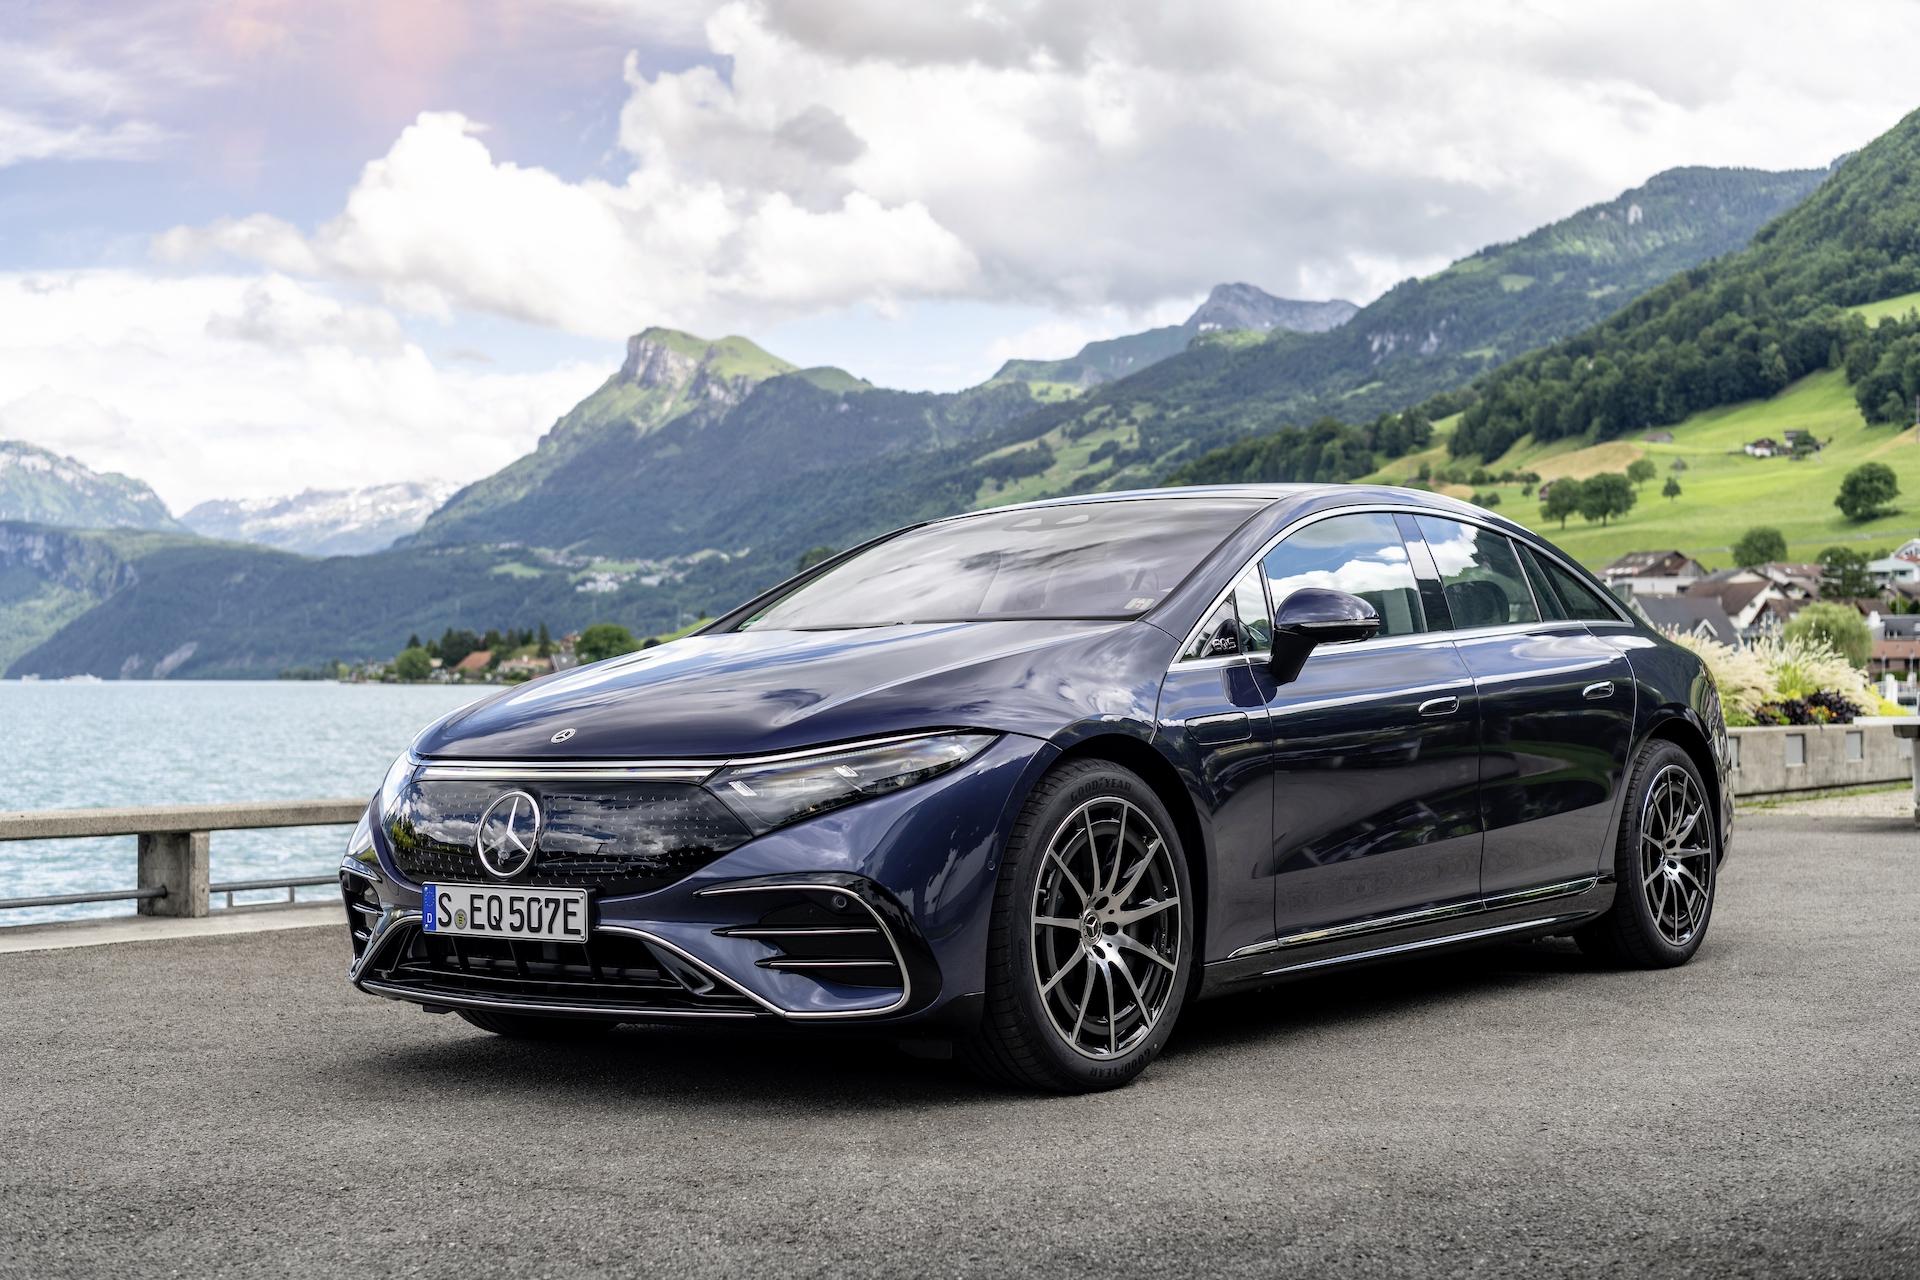 2022 Mercedes-Benz EQS, 2022 Porsche Cayenne Turbo GT, 2022 Subaru WRX: The Week In Reverse